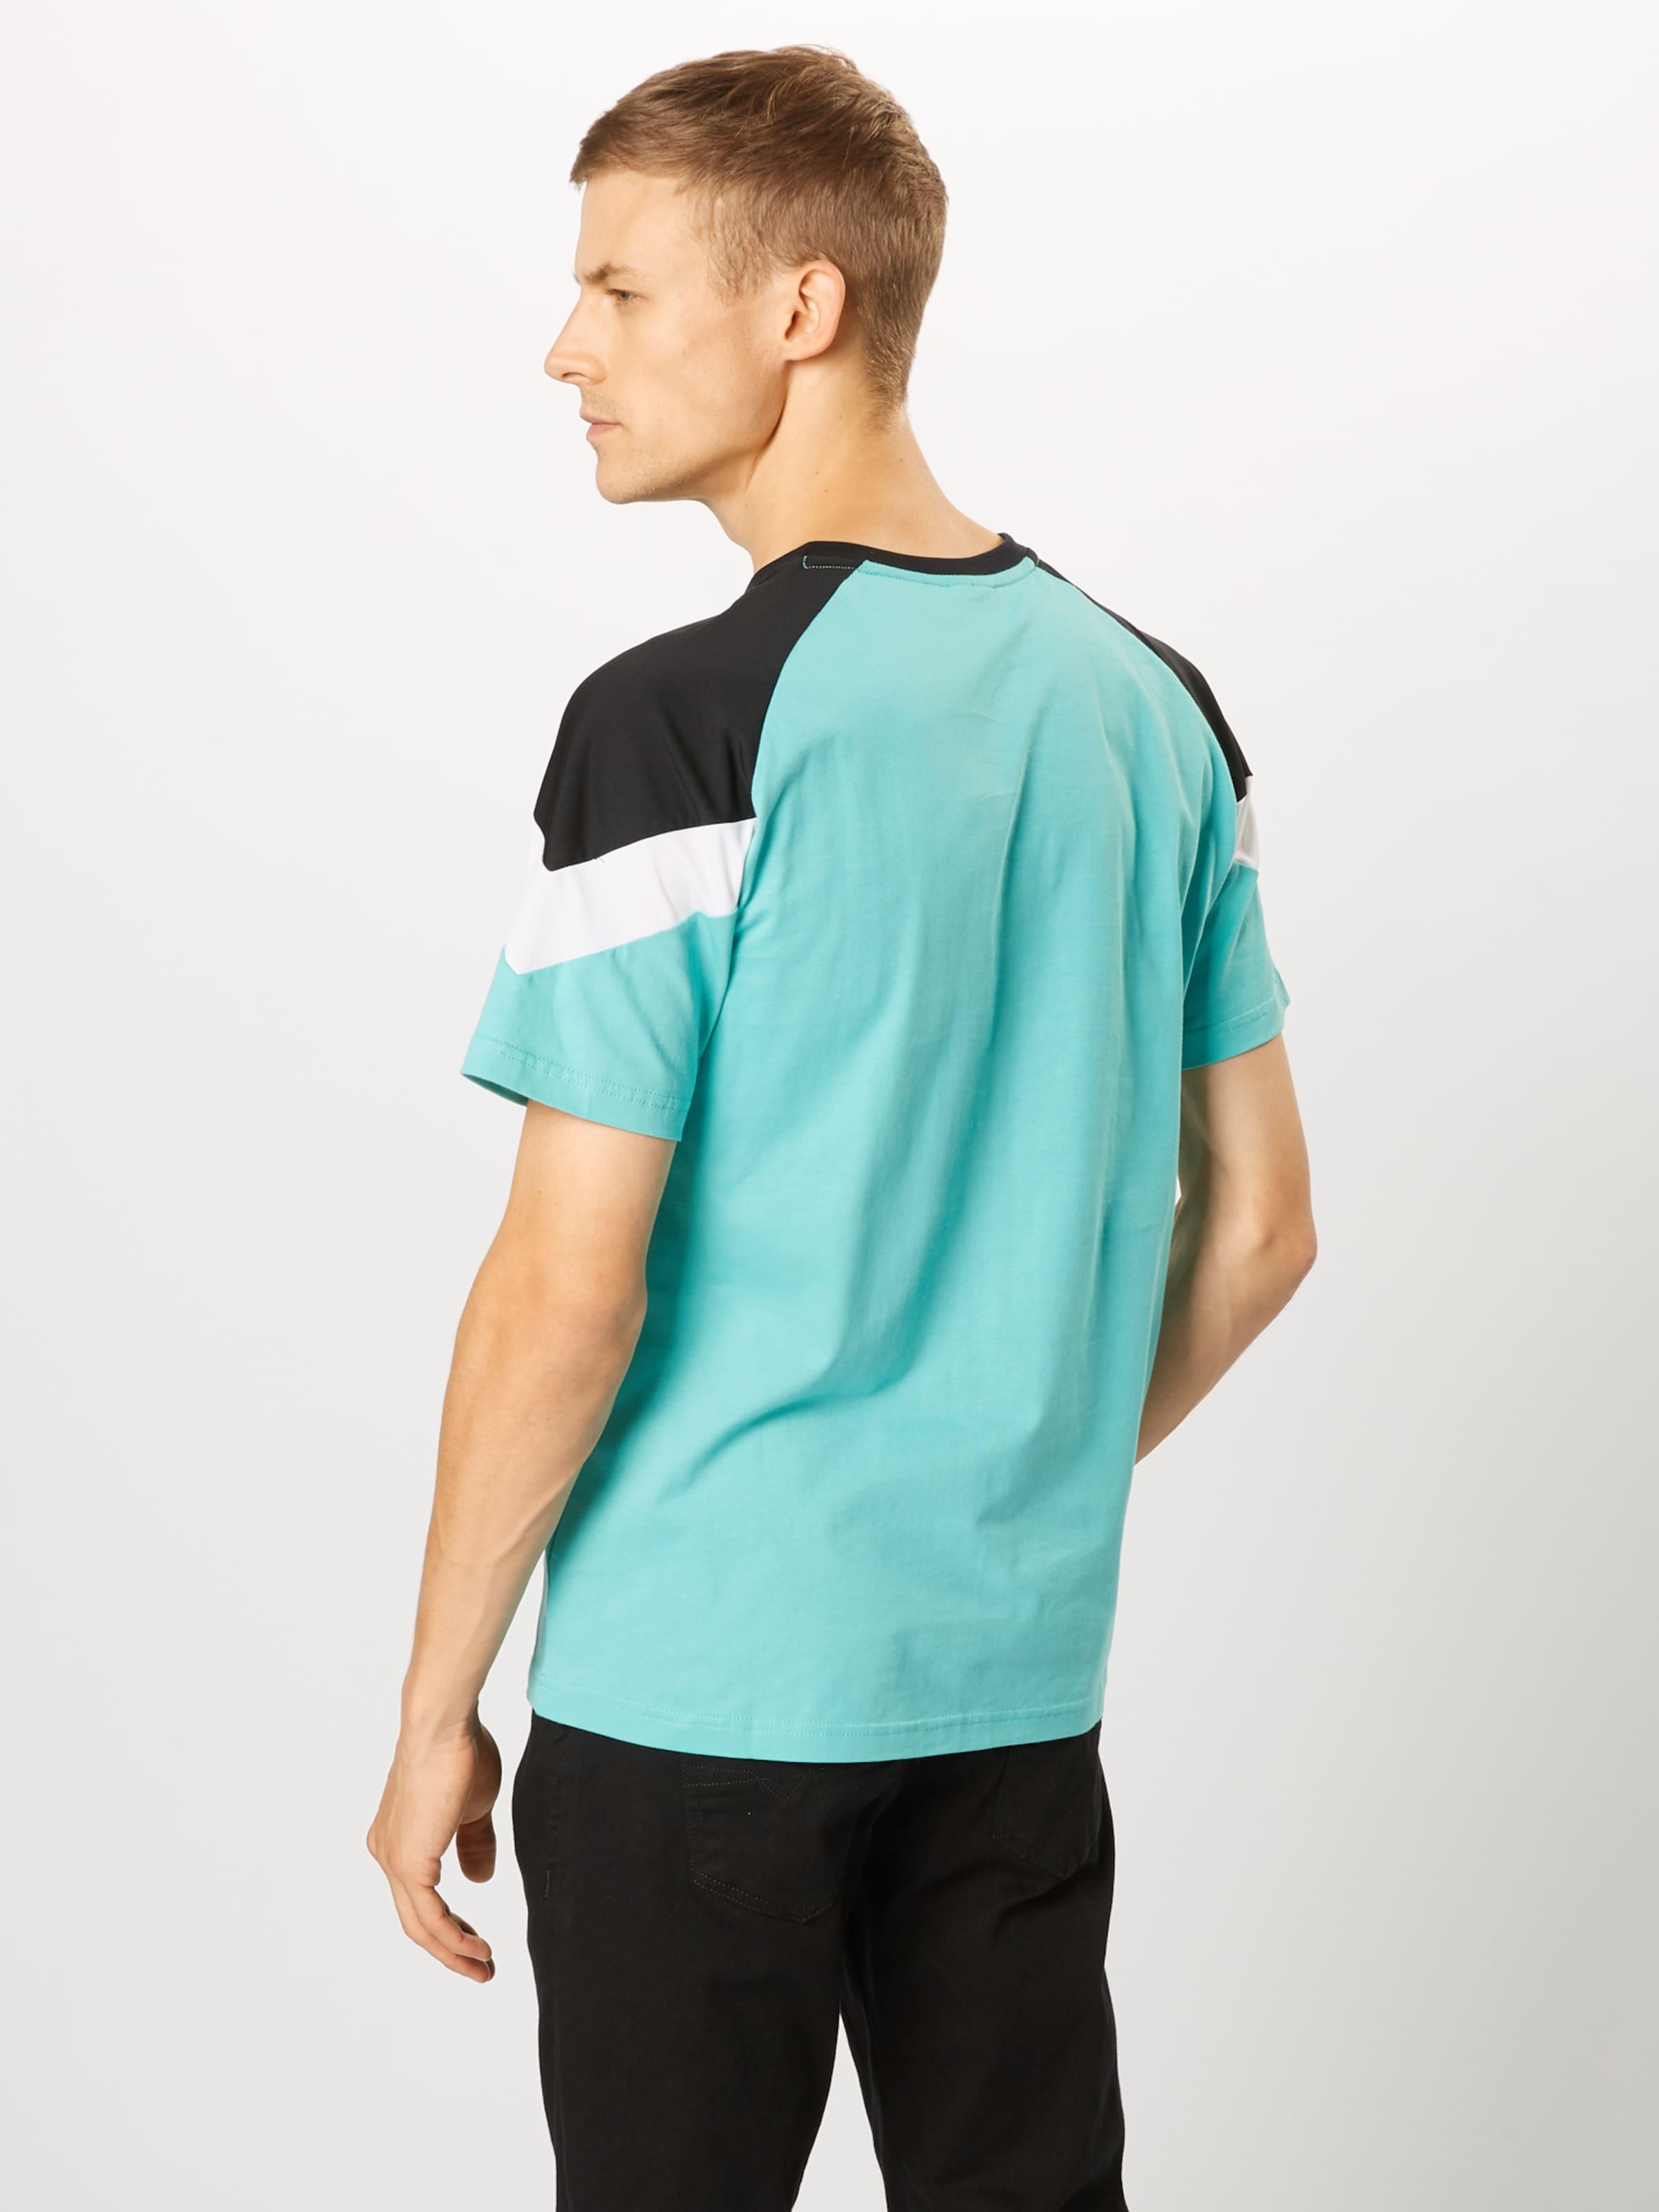 Puma Shirt Shirt In In TürkisSchwarz Puma UGLqpjzMVS